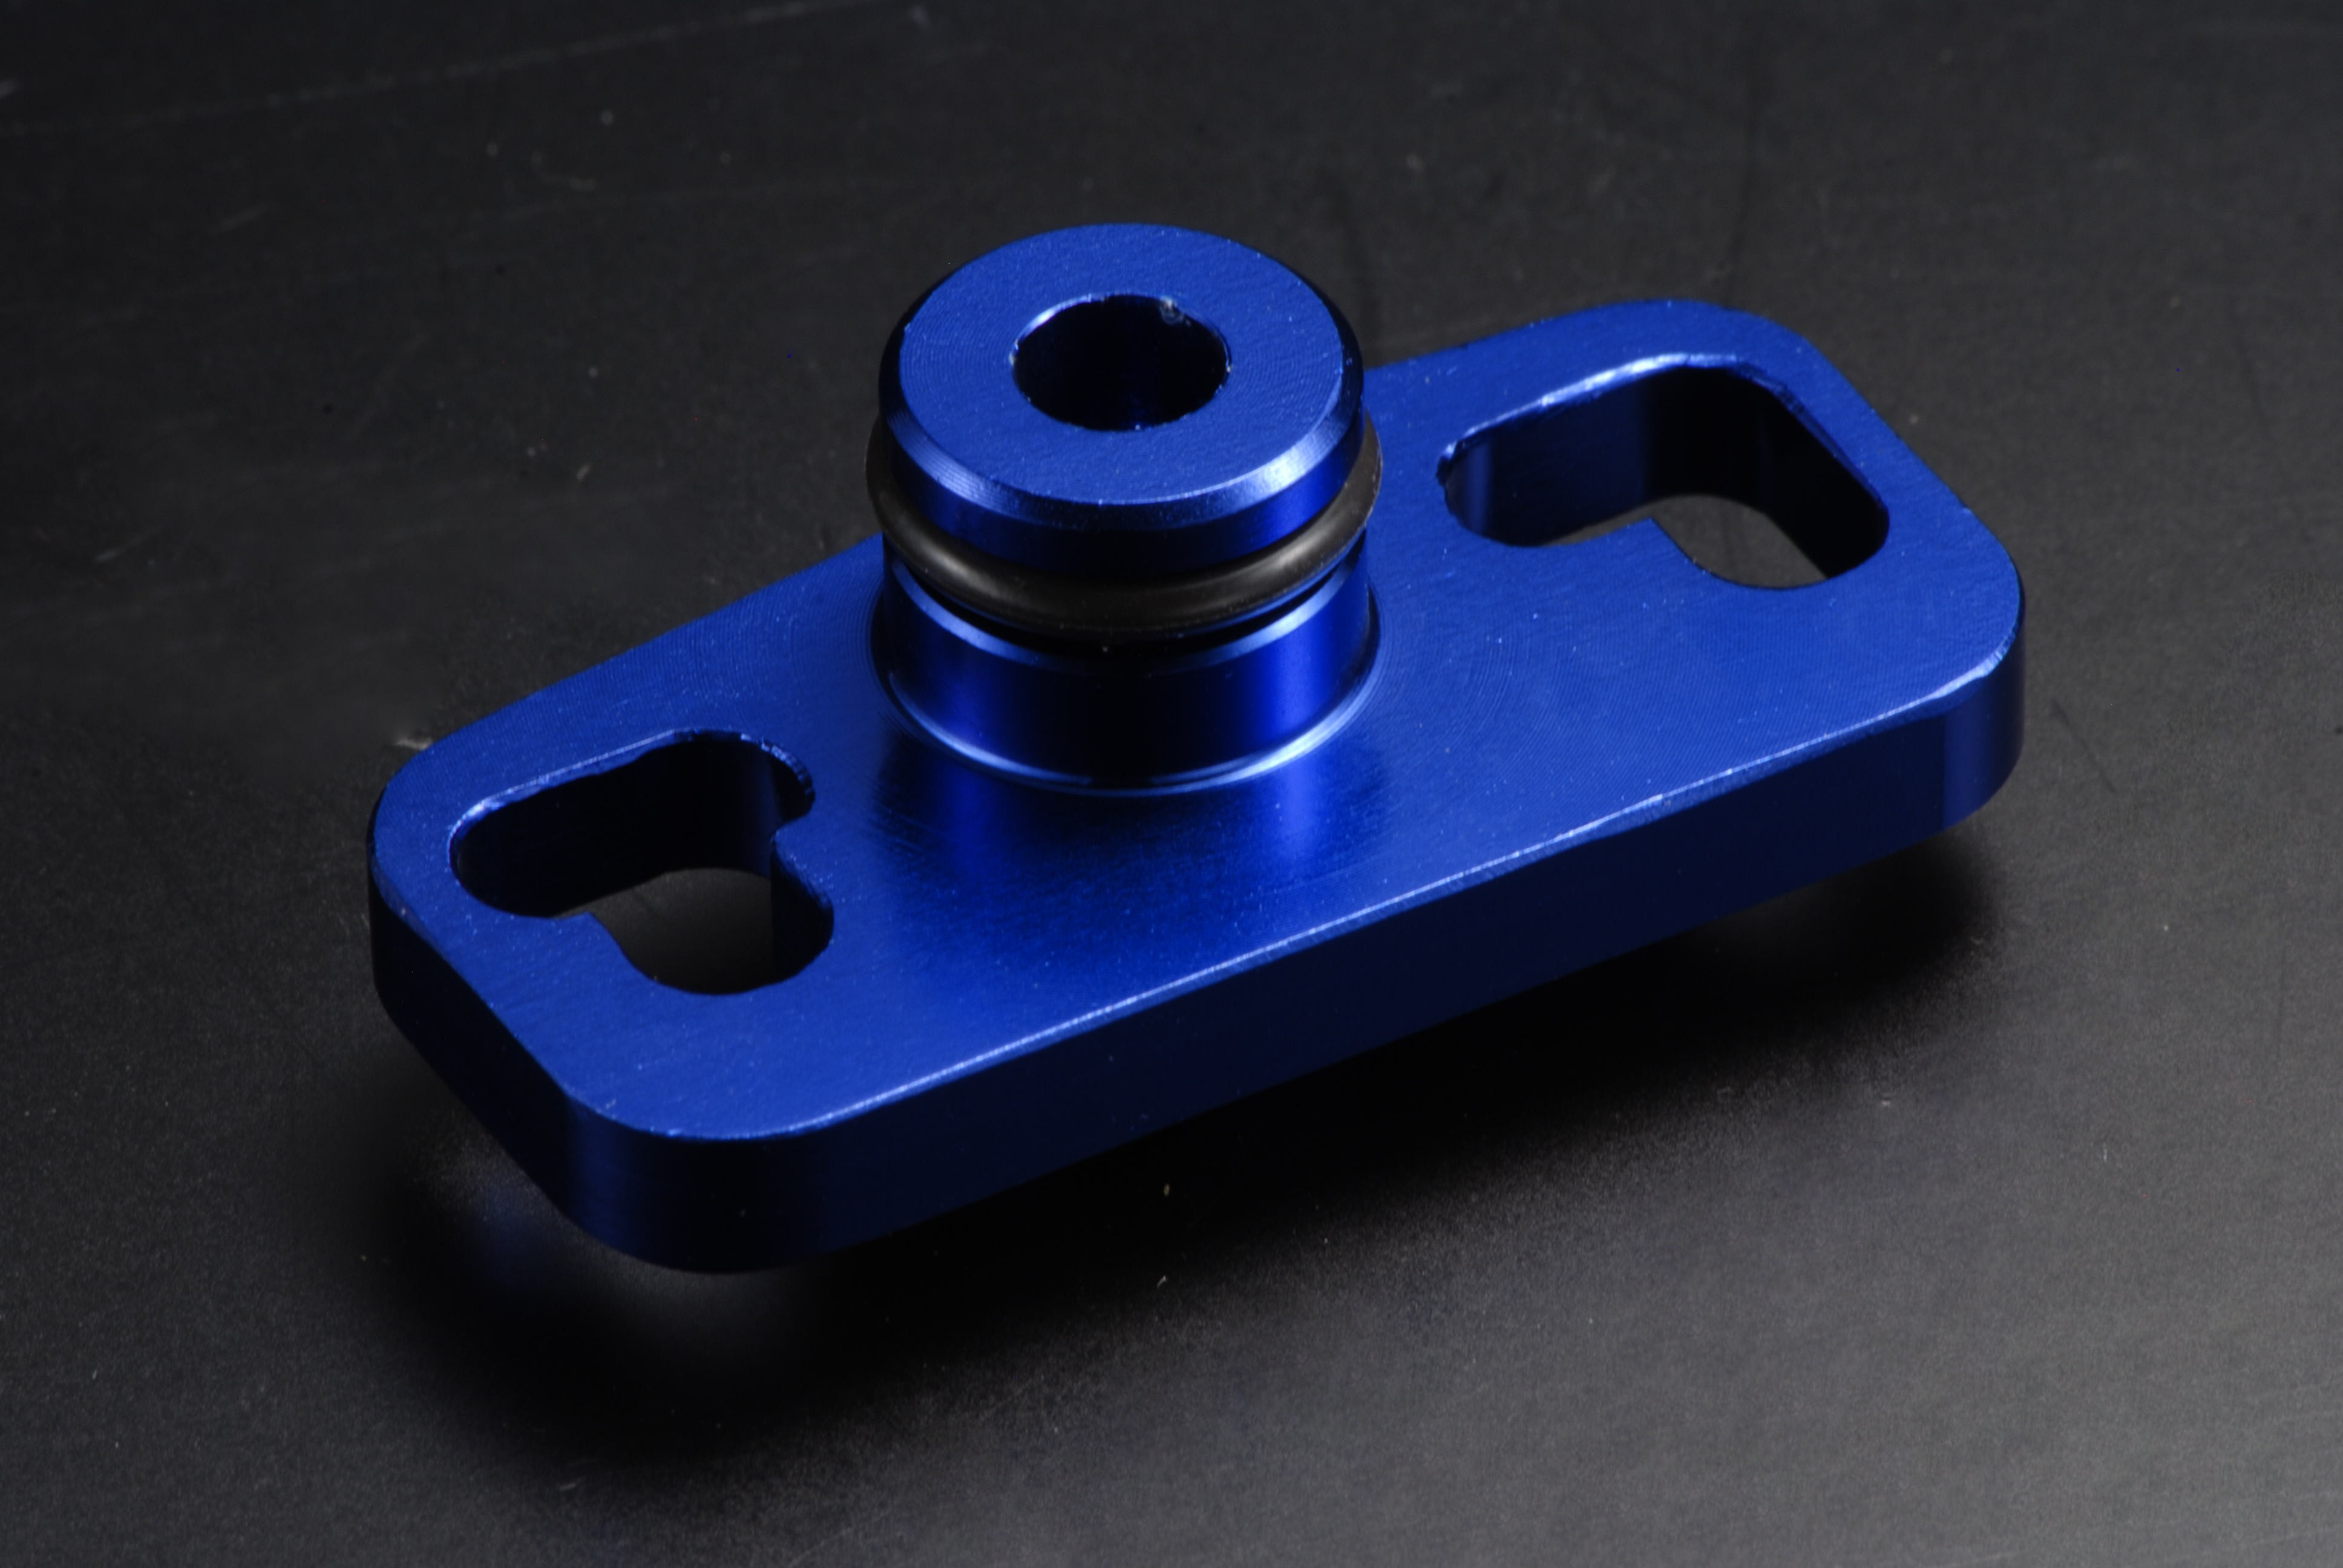 Tomei Fuel Regulator Adapter/Fitting Parts